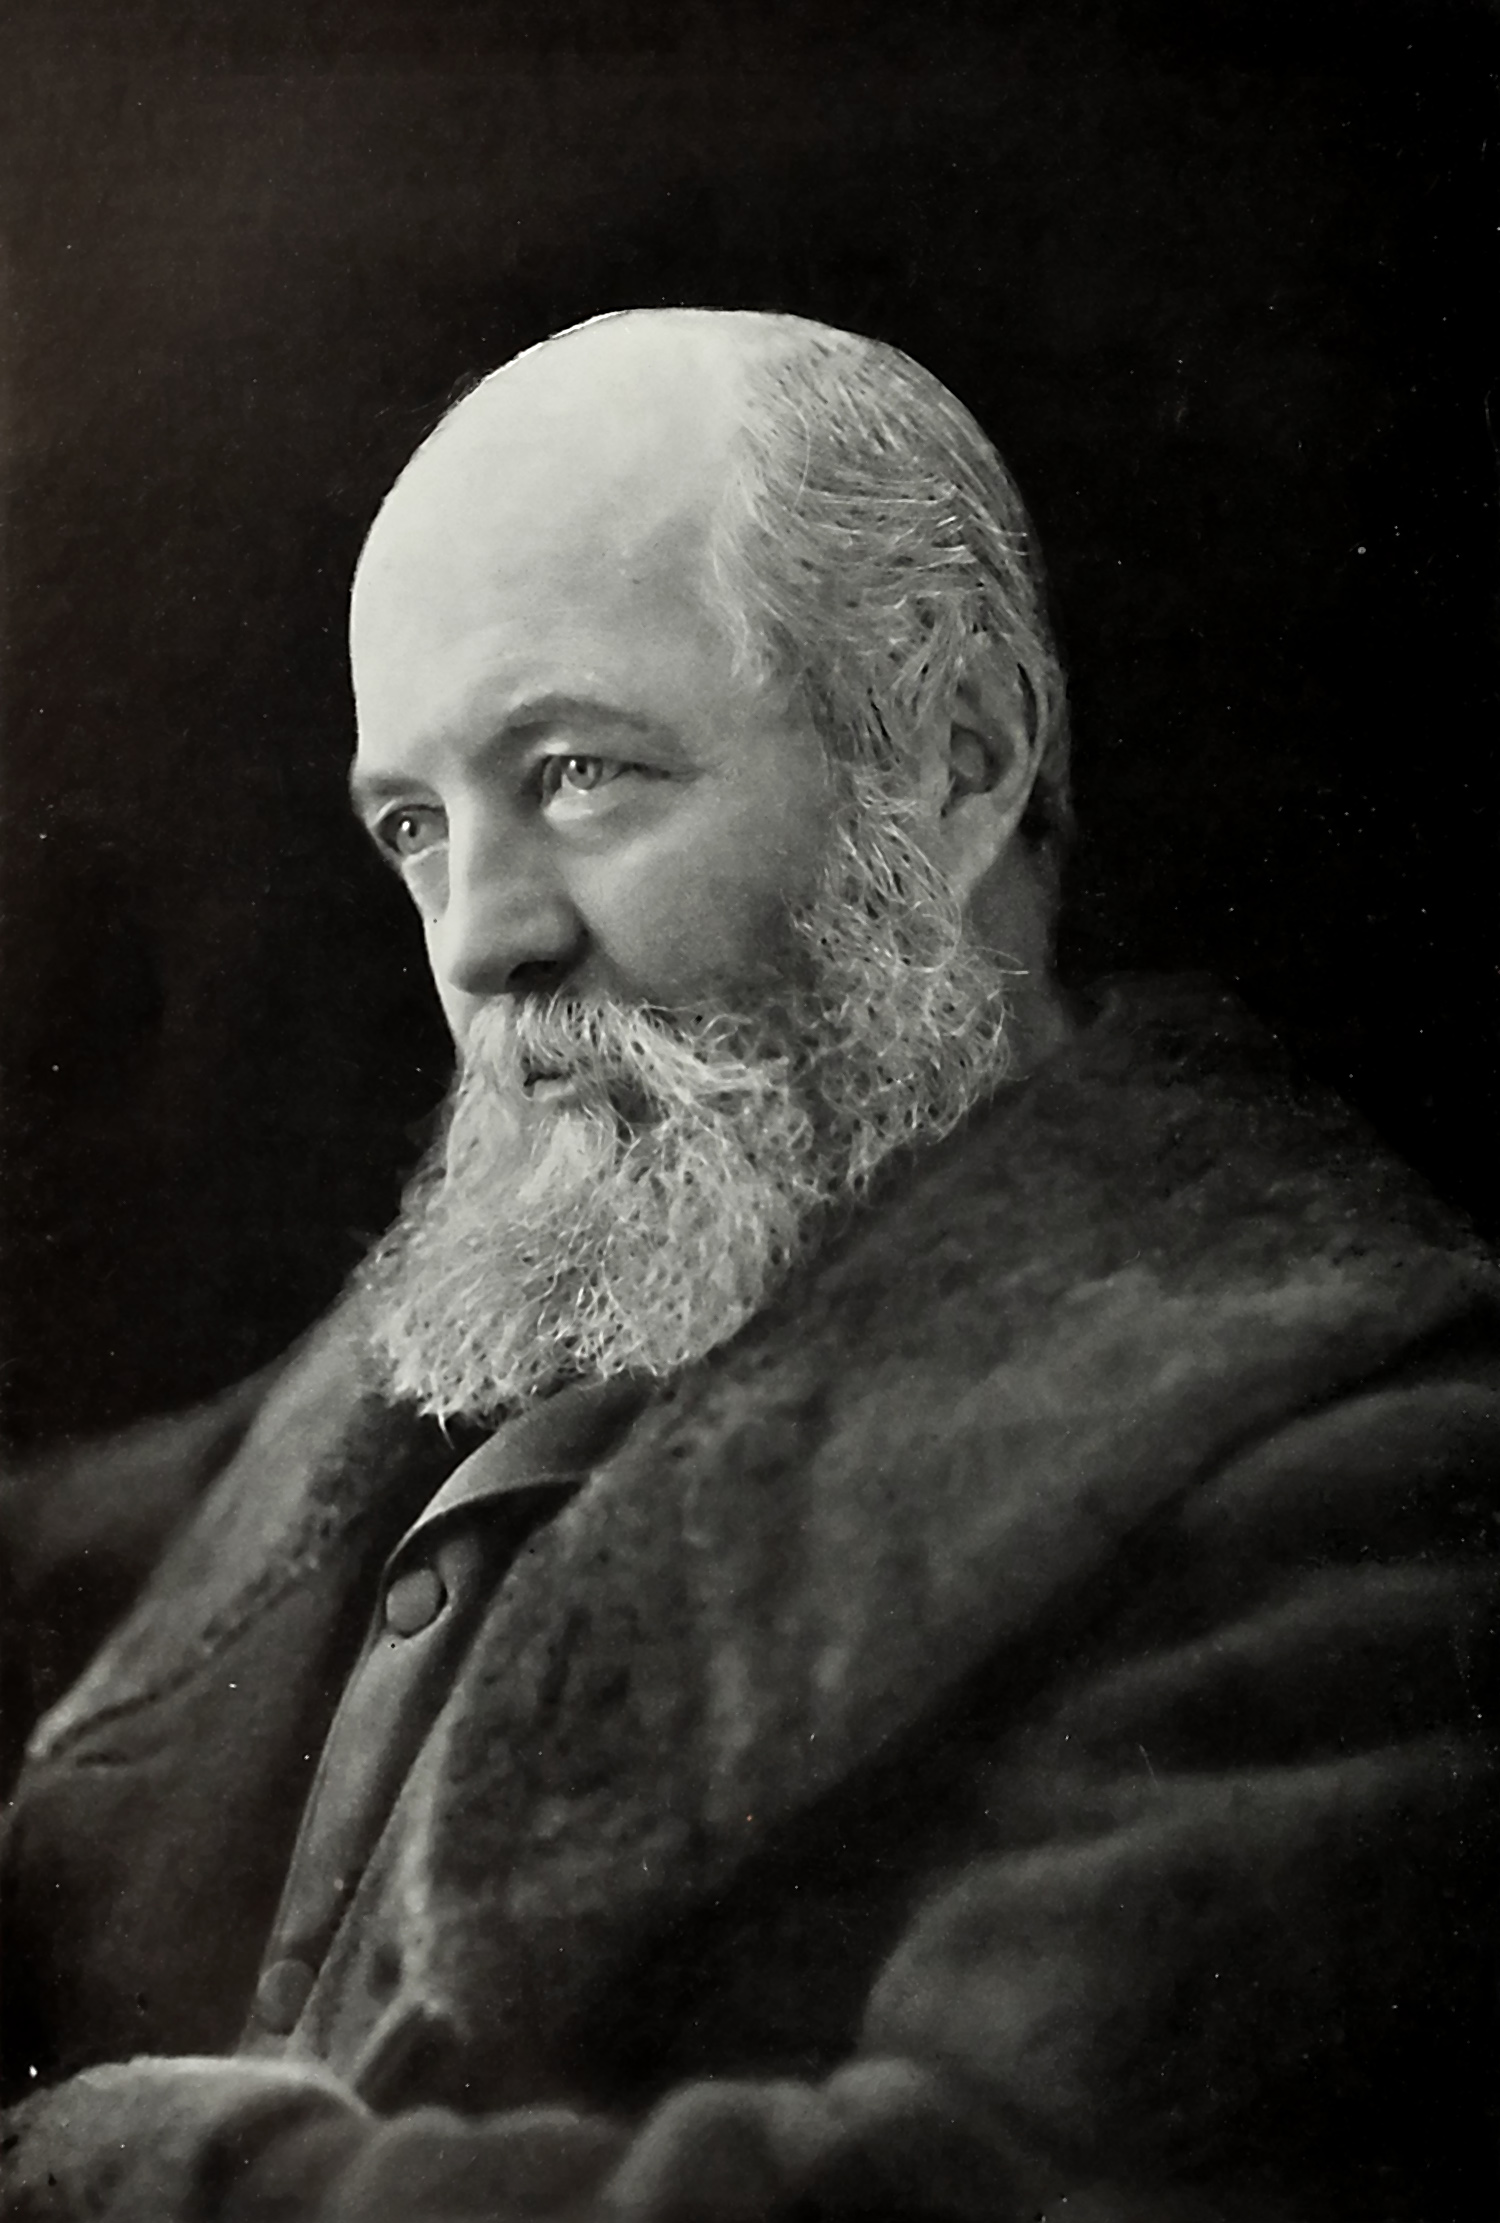 Portrait de Frederick Law Olmsted